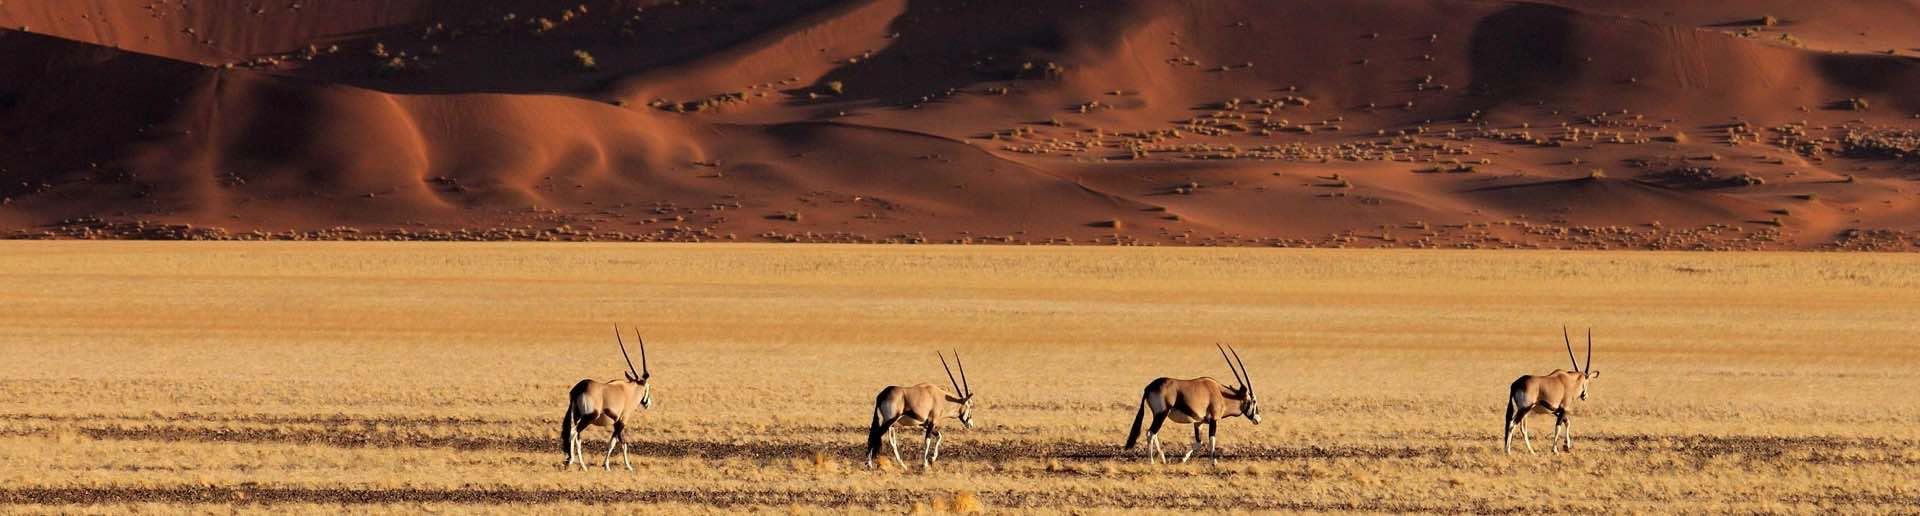 Africa-Namibia-Hunting-Safaris-Gemsbok-O